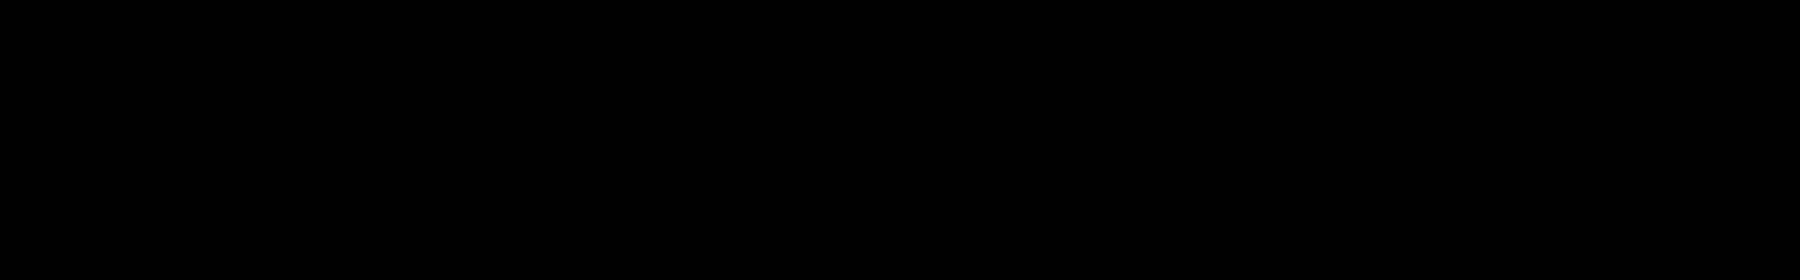 Signature Bass House audio waveform